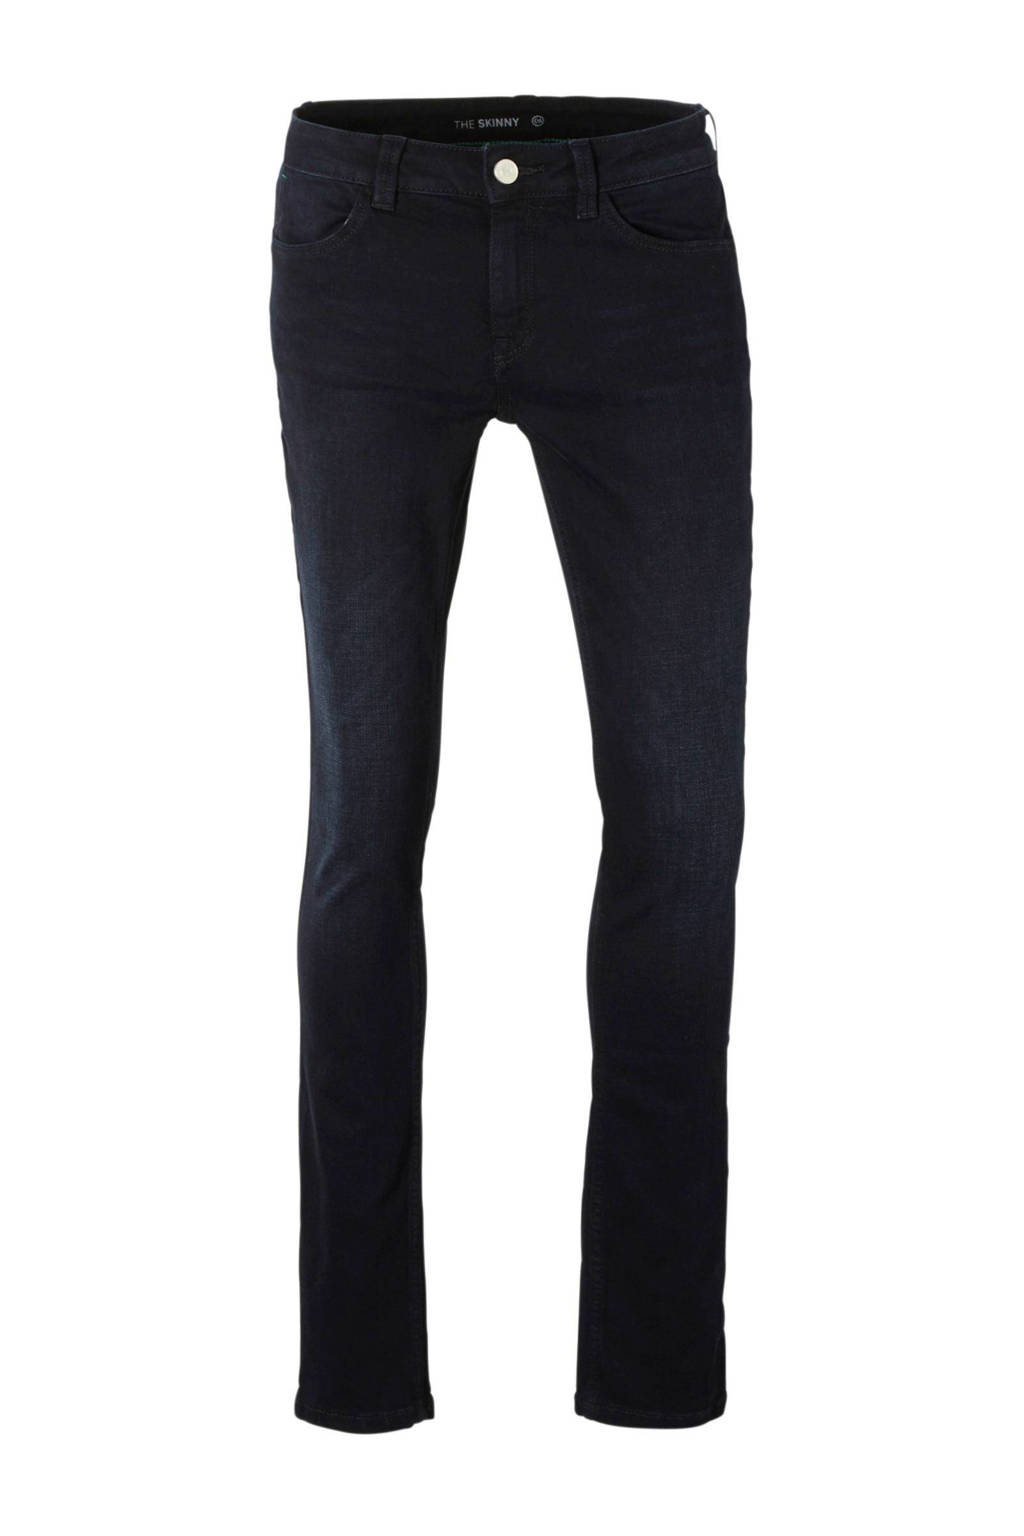 C&A The Denim skinny jeans, Donkerblauw